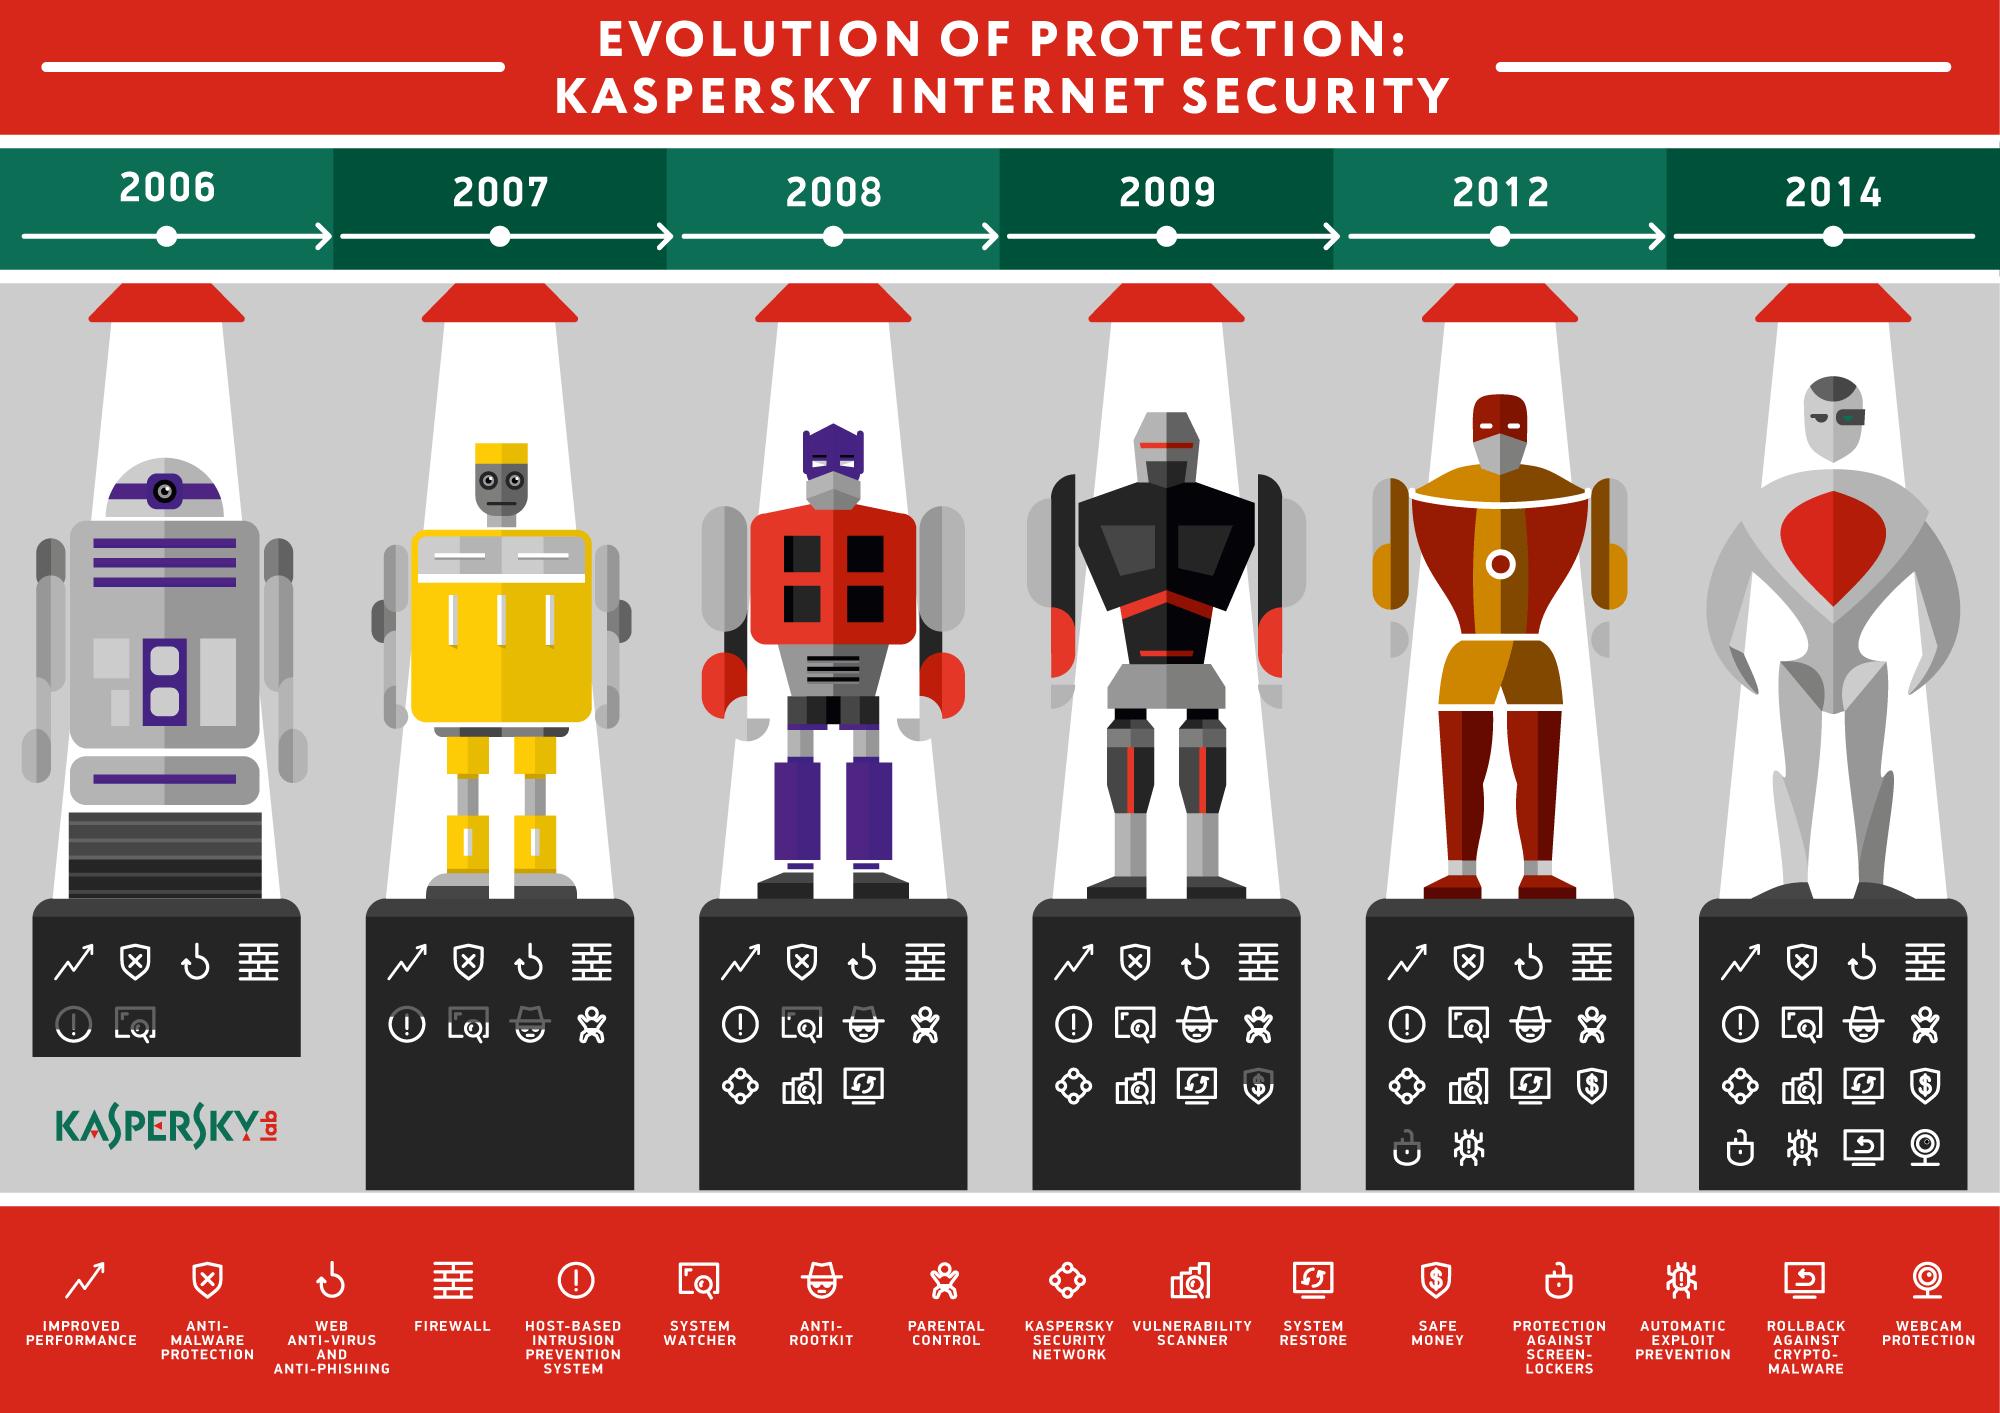 Evolution-of-Protection_fnl_2